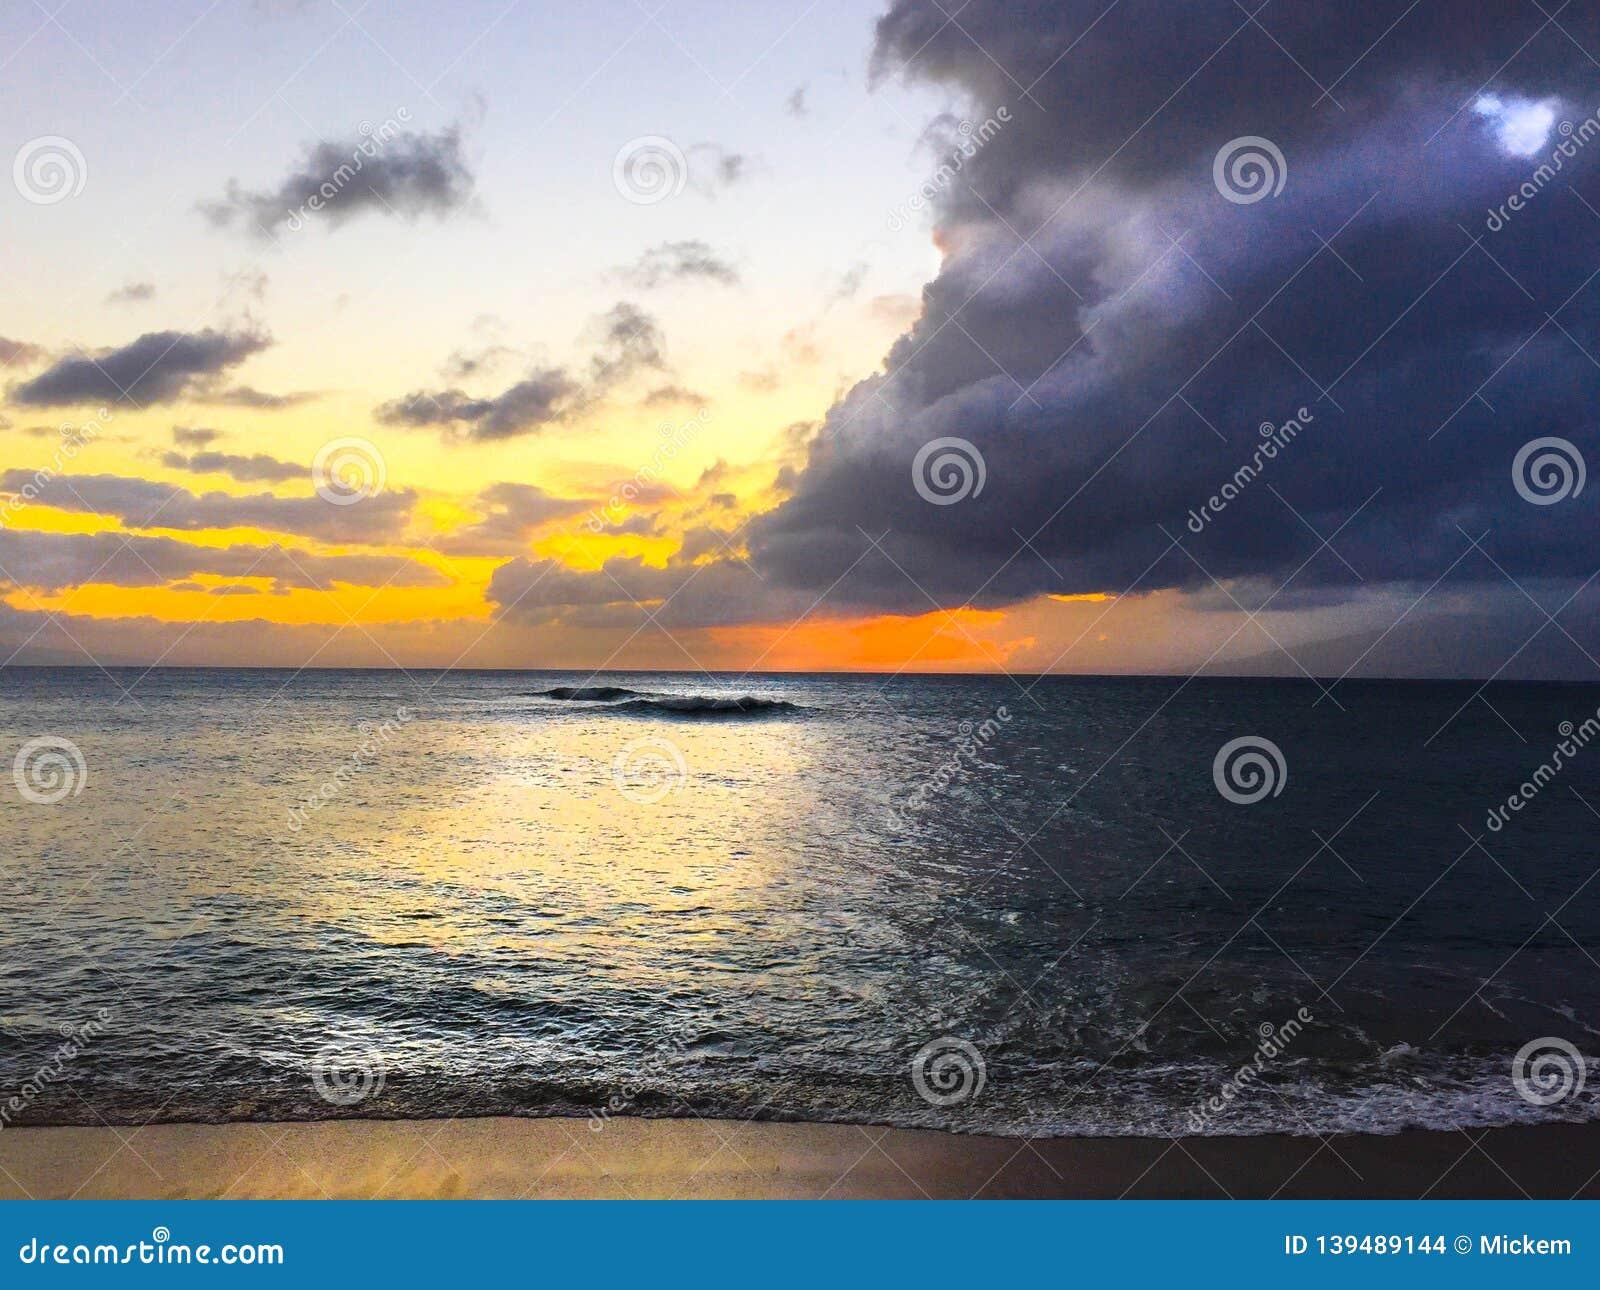 Storm Clouds Sunset Ocean